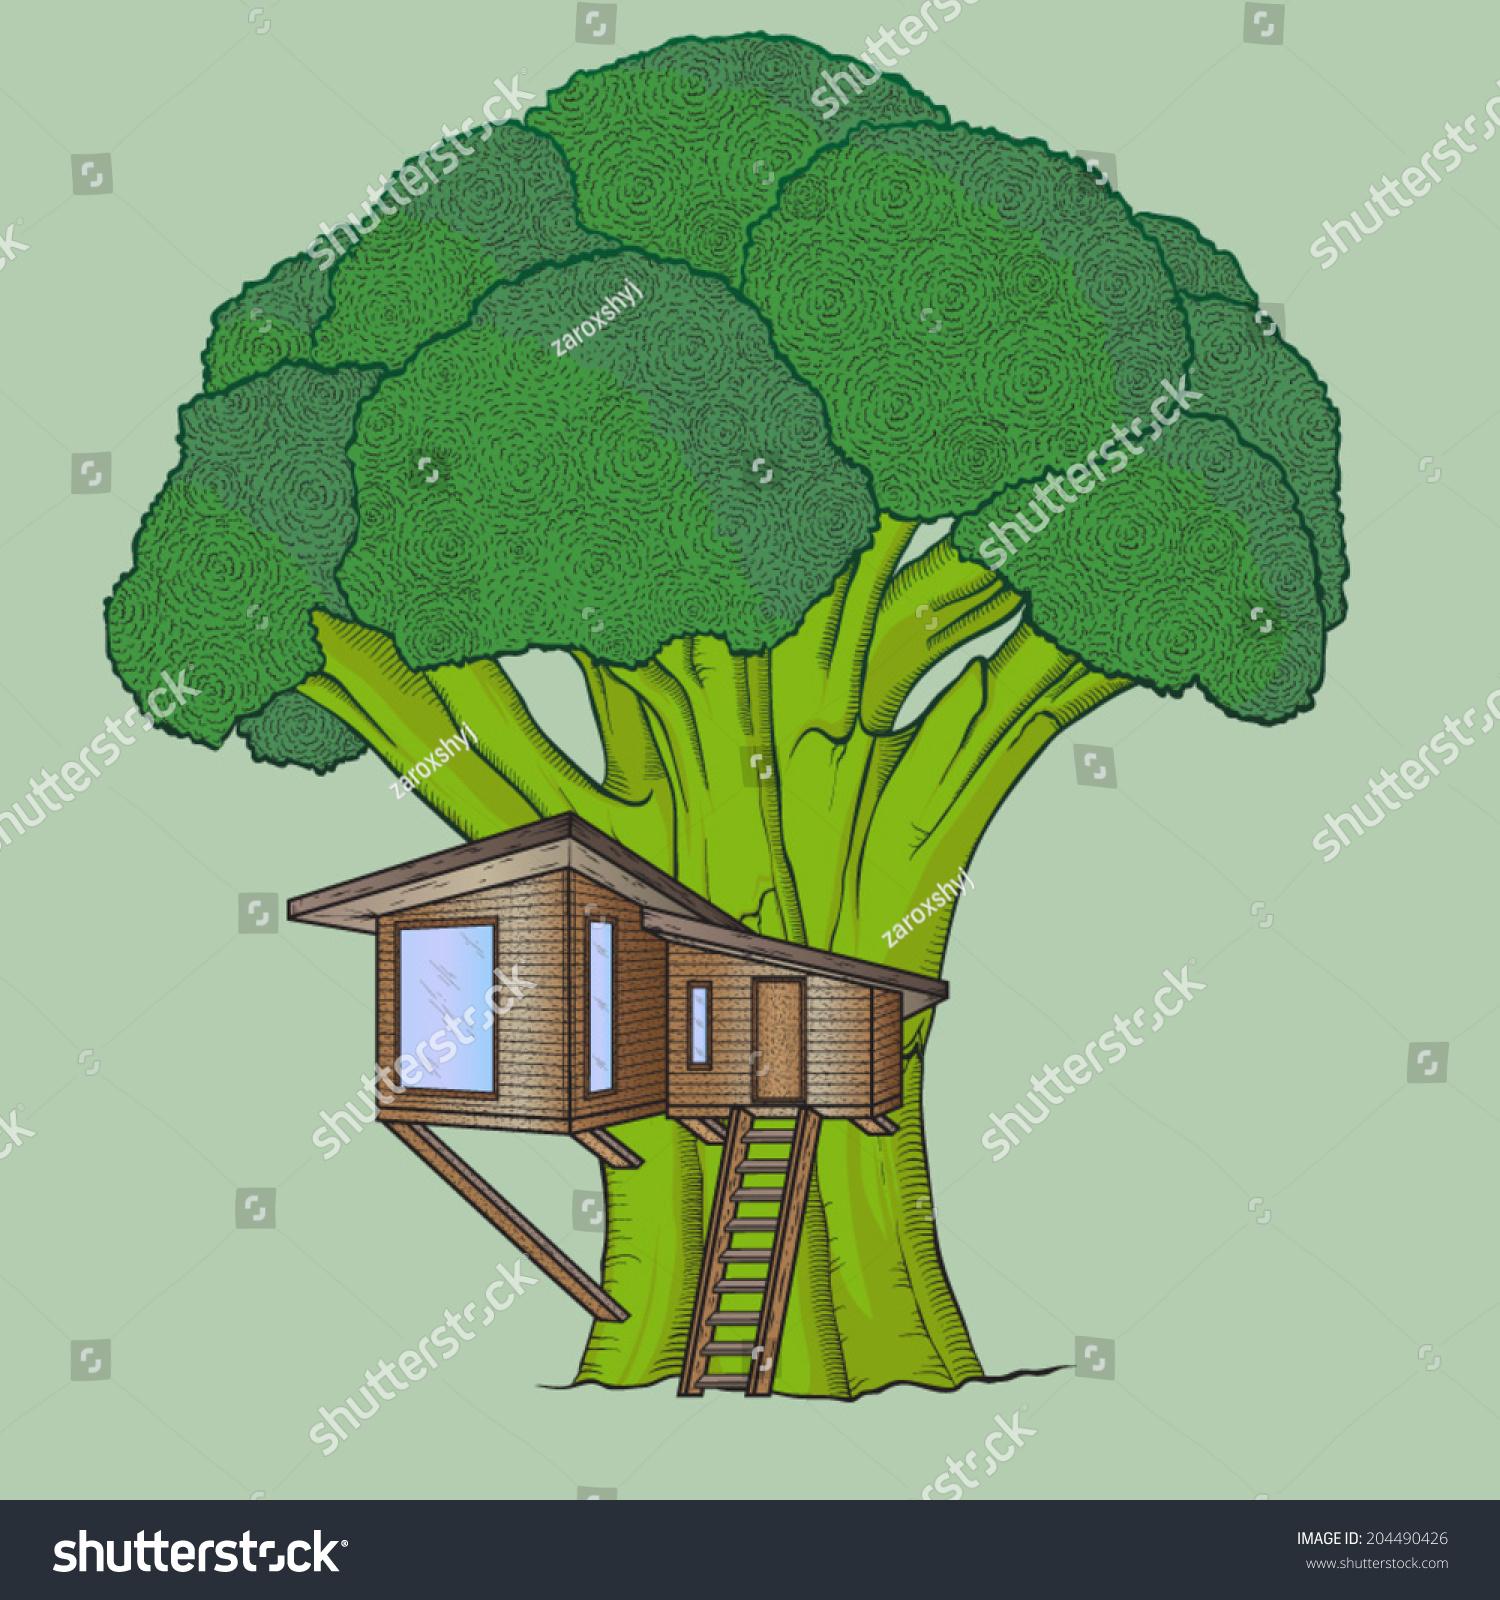 eco-house西兰花树,手绘,矢量插图